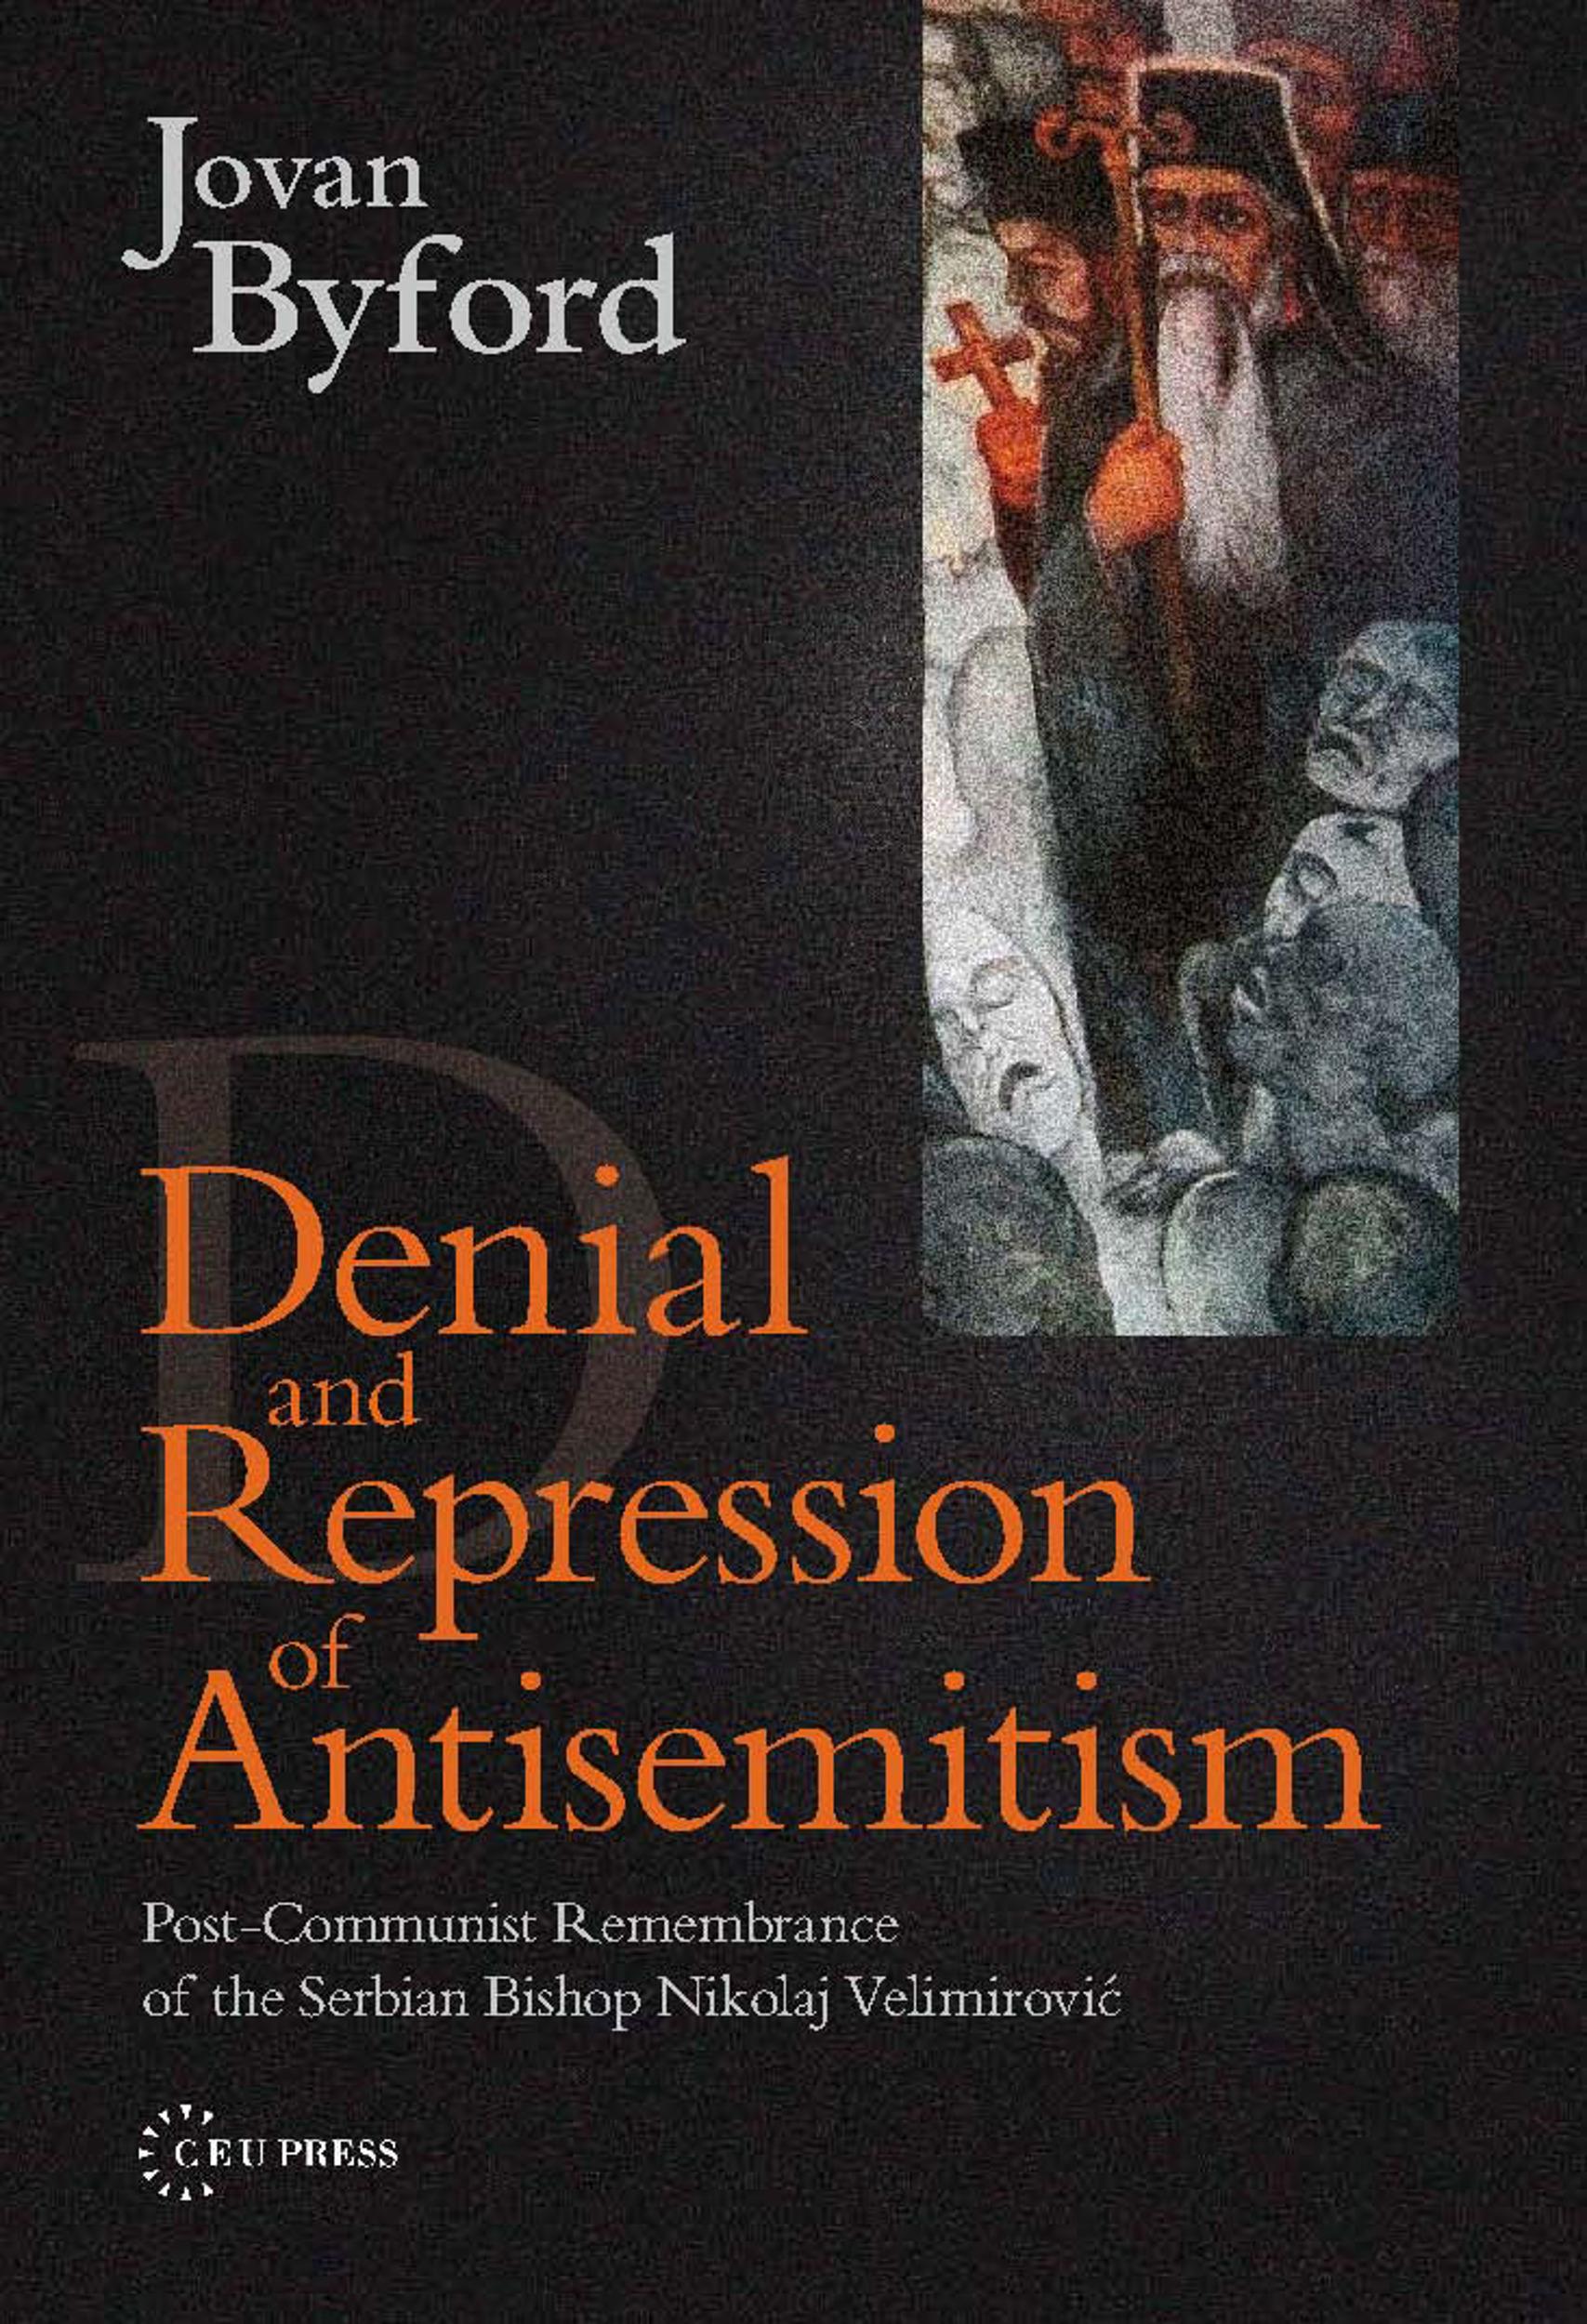 Denial and Repression of Antisemitism